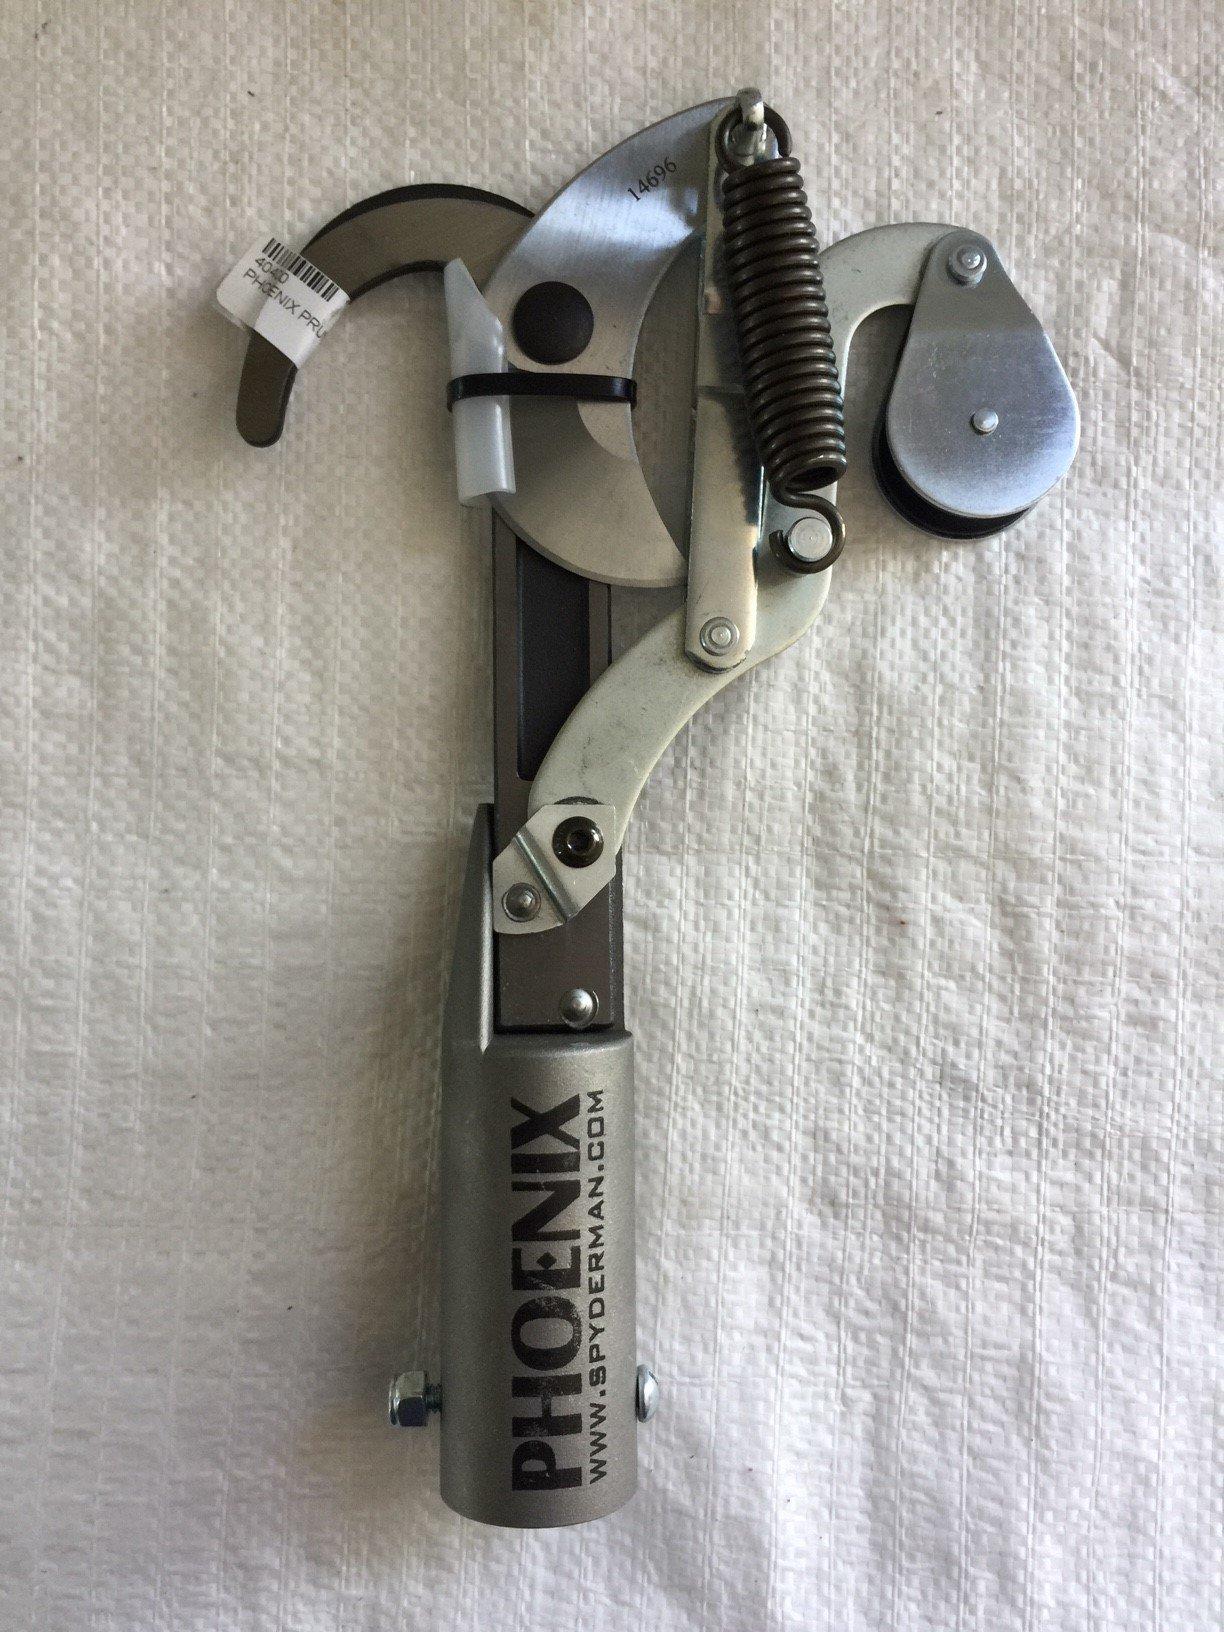 Phoenix Pruner Head Professional 1 3/4 cut for Octagonal Poles Made in U.S.A. by Phoenix Tools